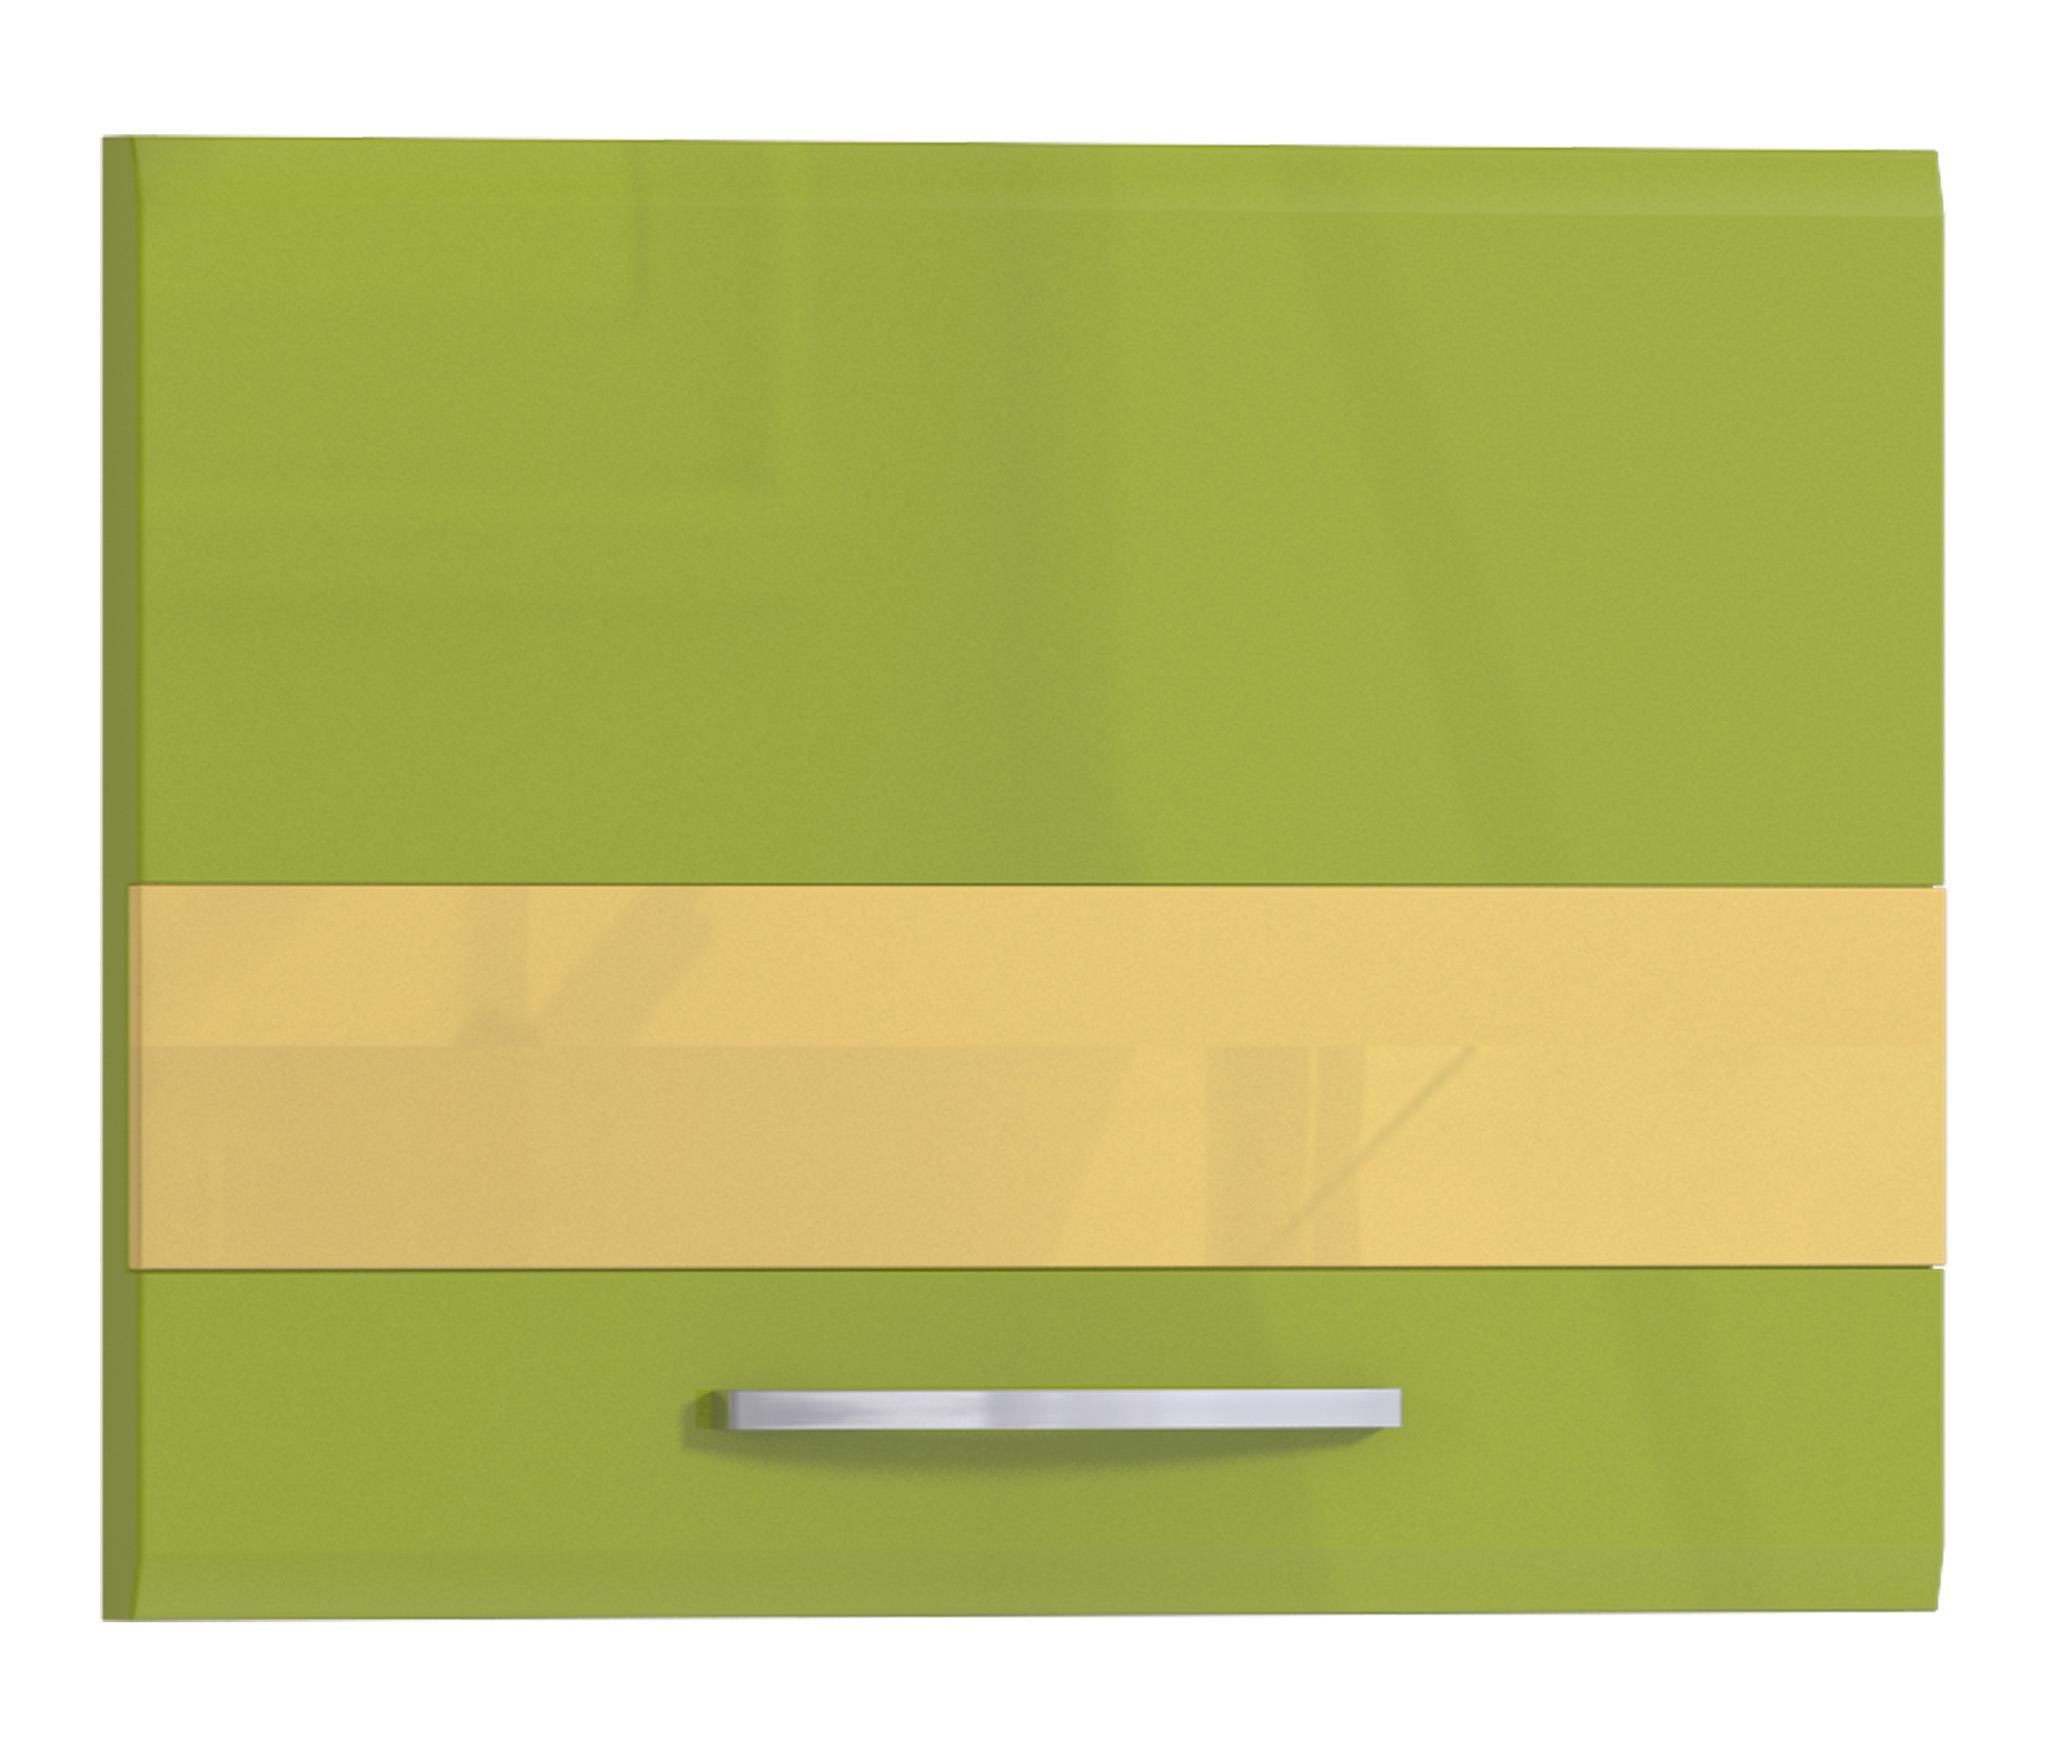 Фасад Регина Ф-250 к корпусу РП-250Мебель для кухни<br>Дверца для верхней части шкафа.